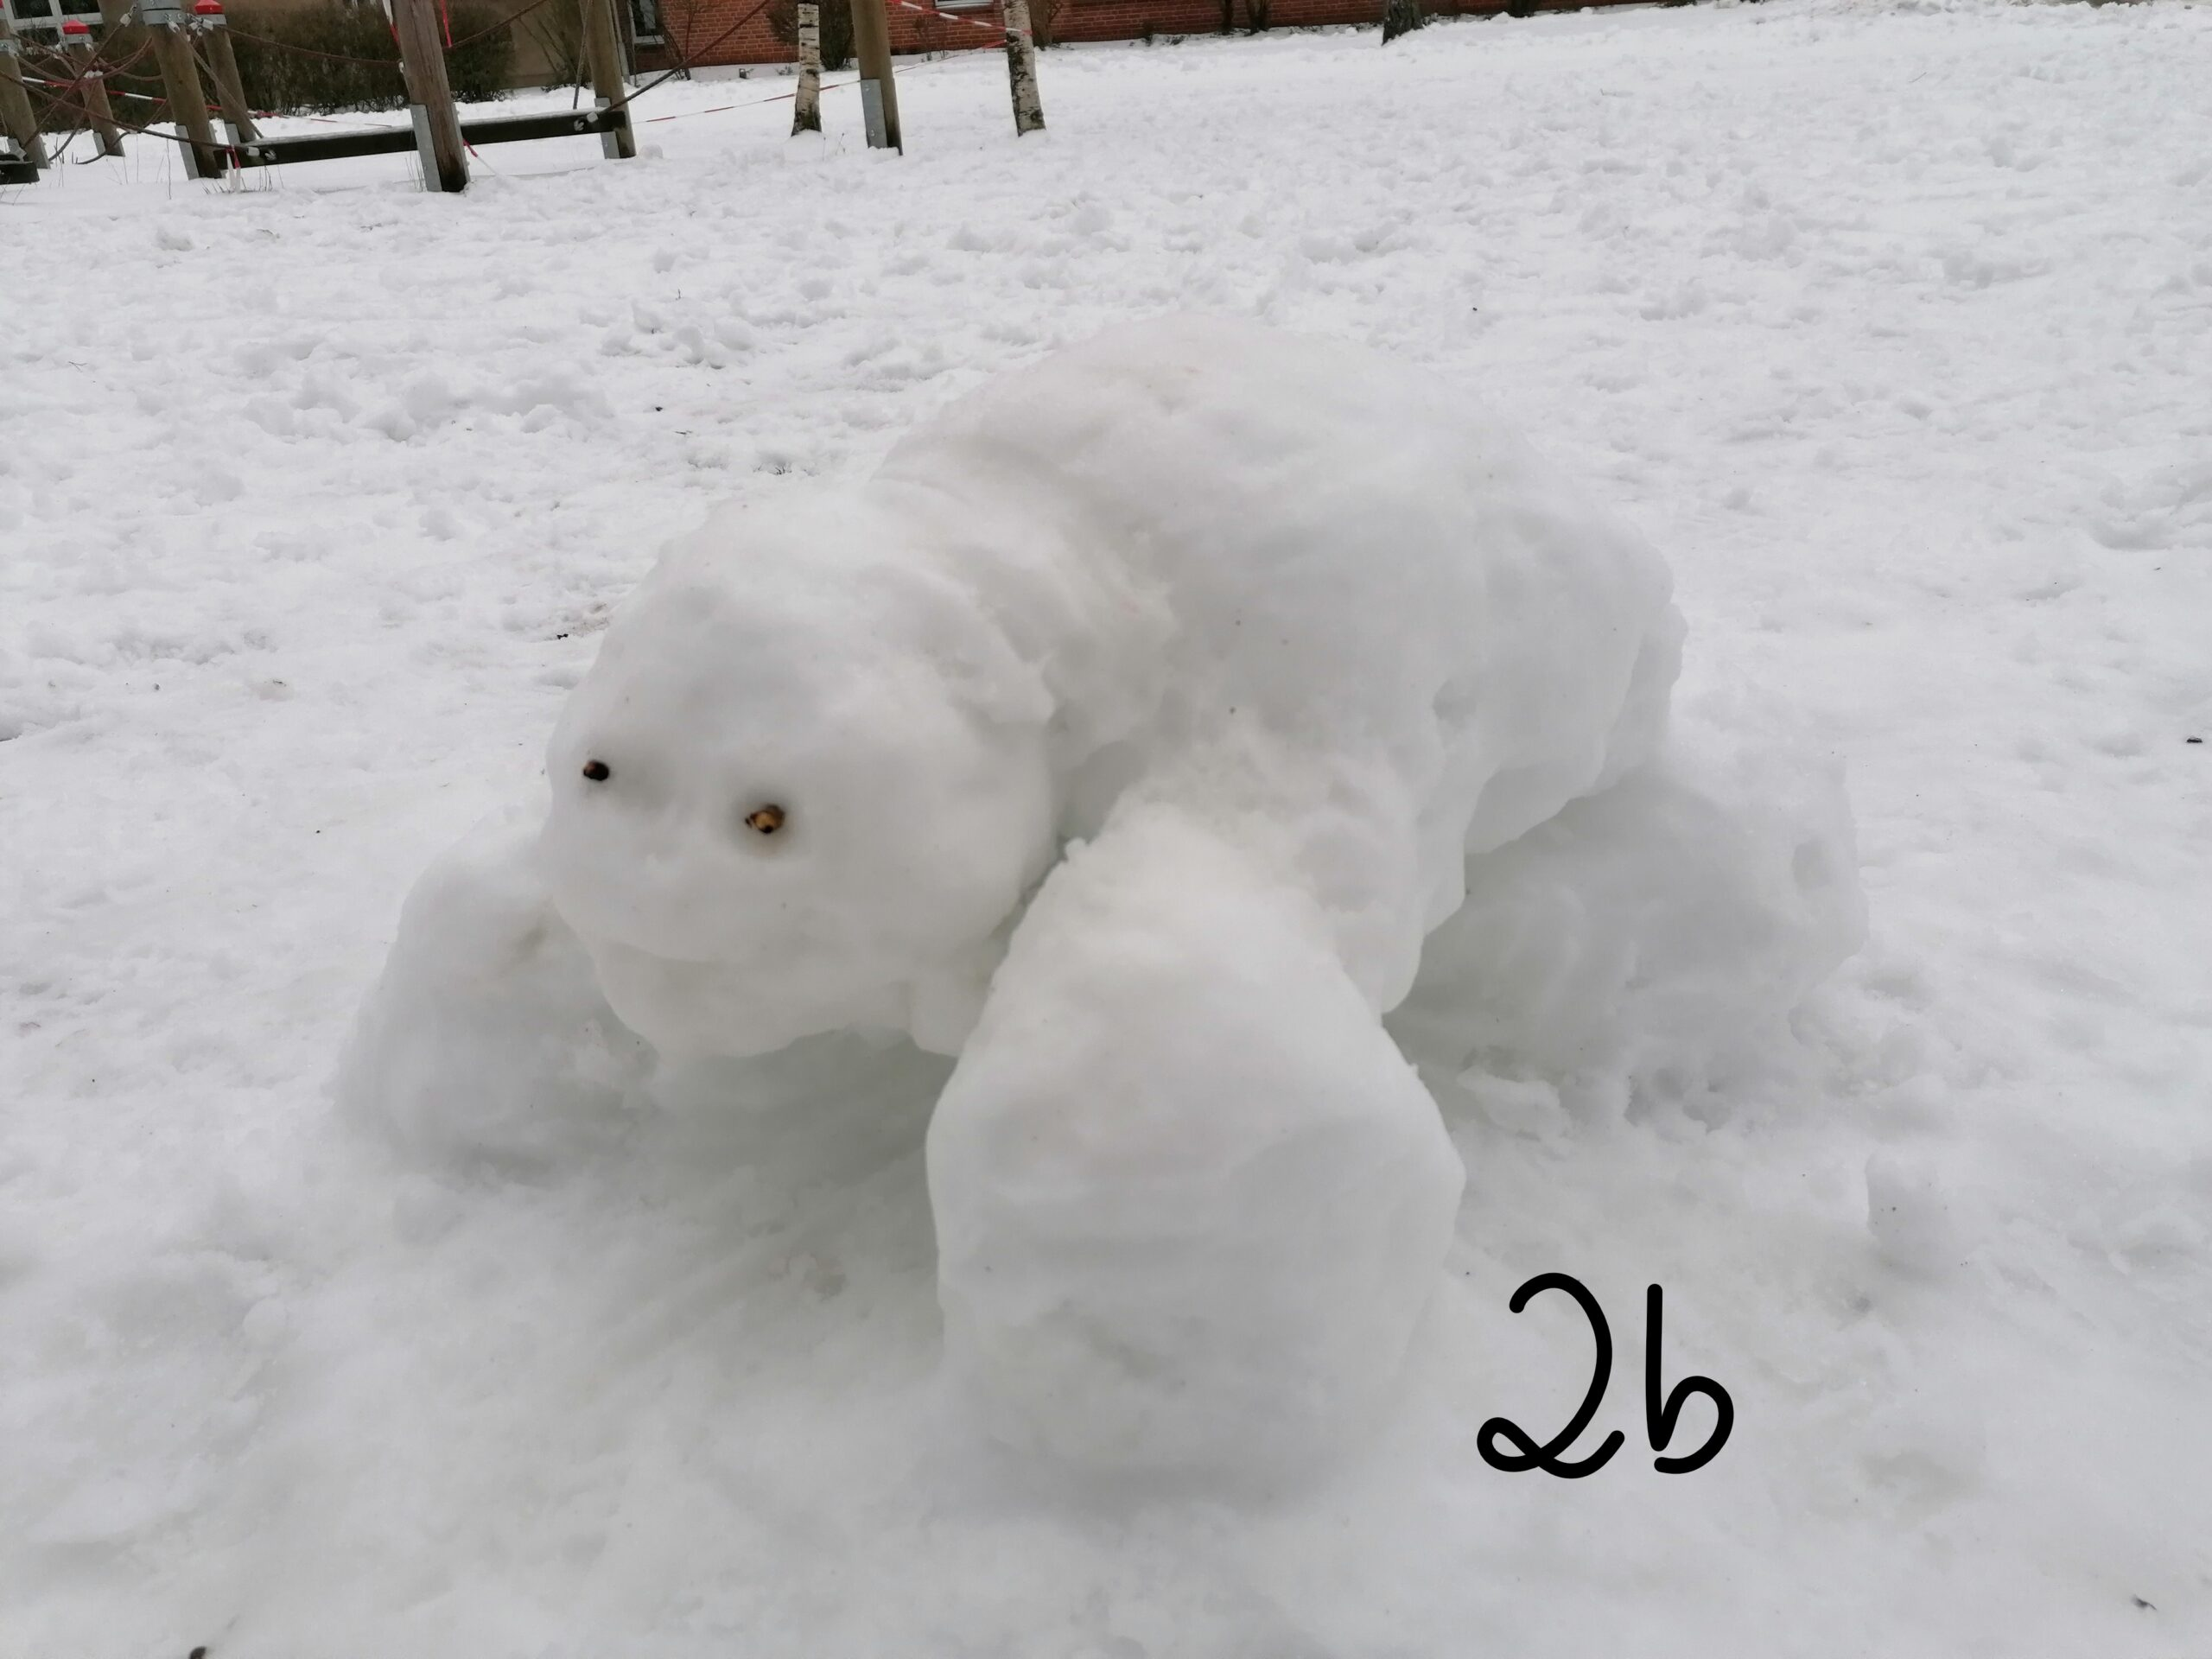 Schneefiguren_2b